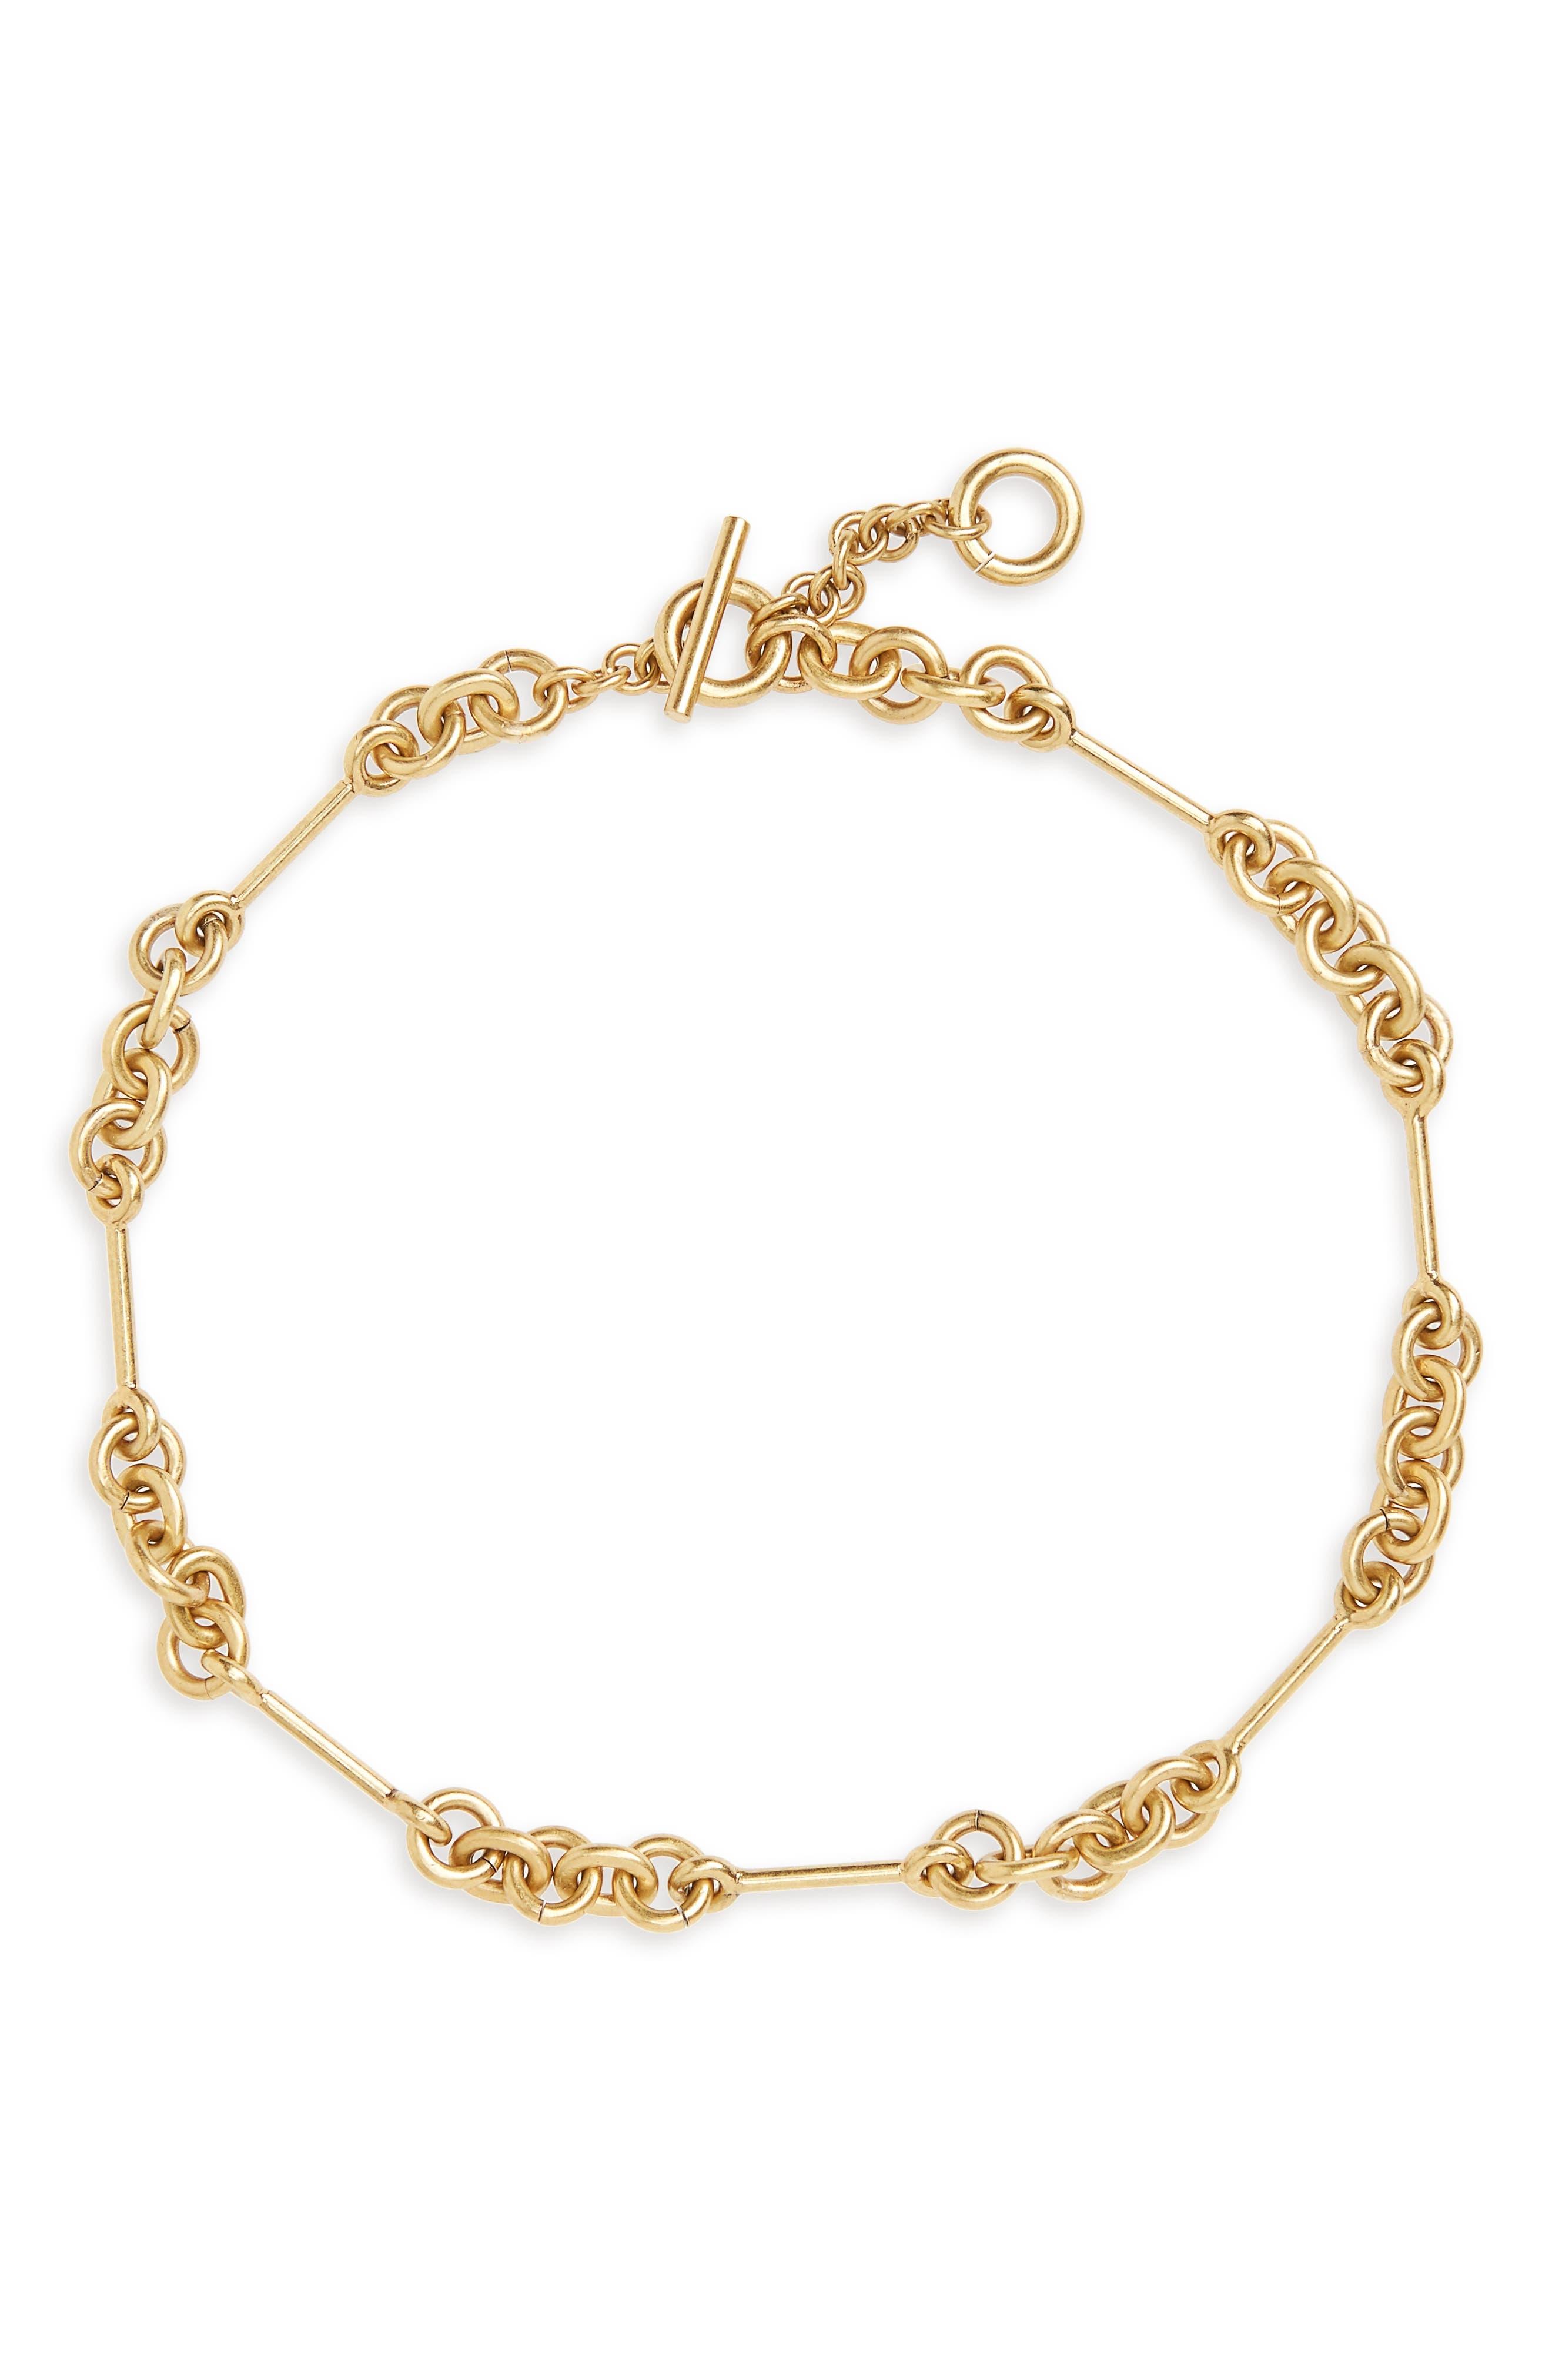 Main Image - Madewell Circle Link Choker Necklace